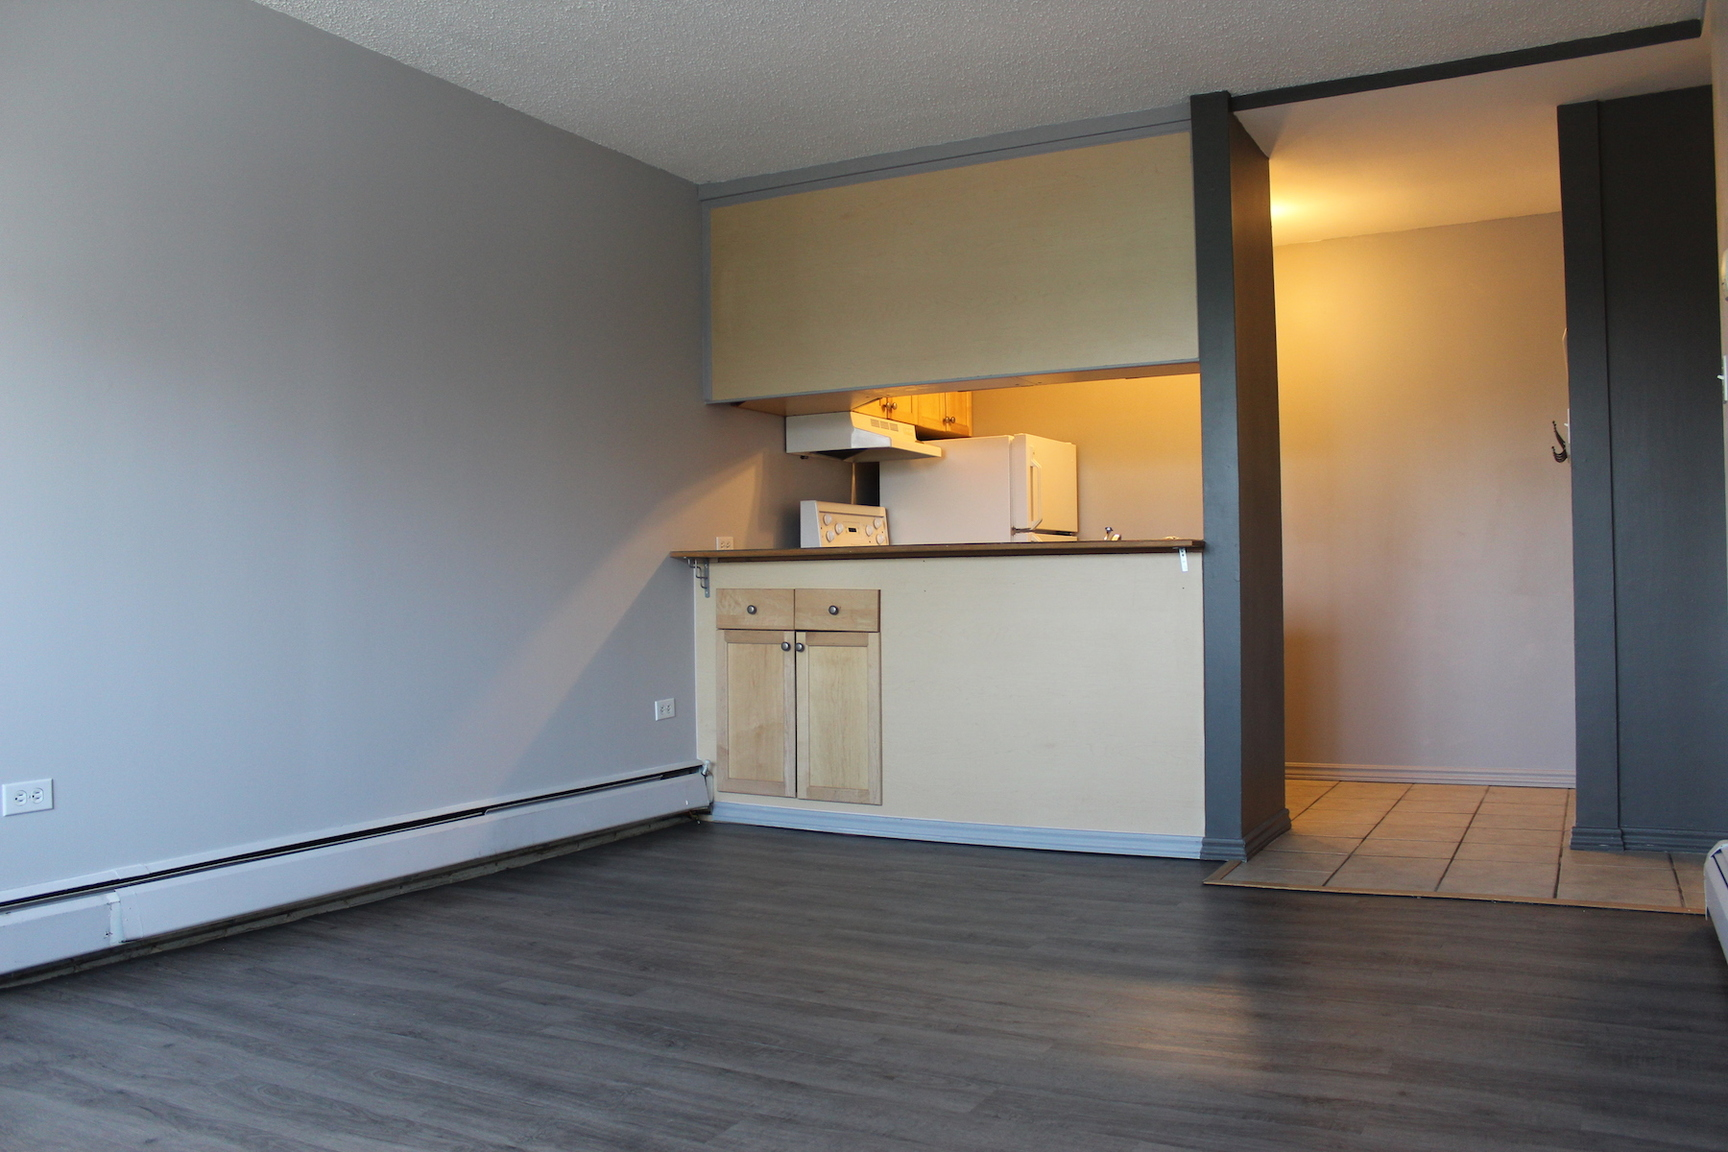 2403 33 Ave SW, Calgary, AB - $925